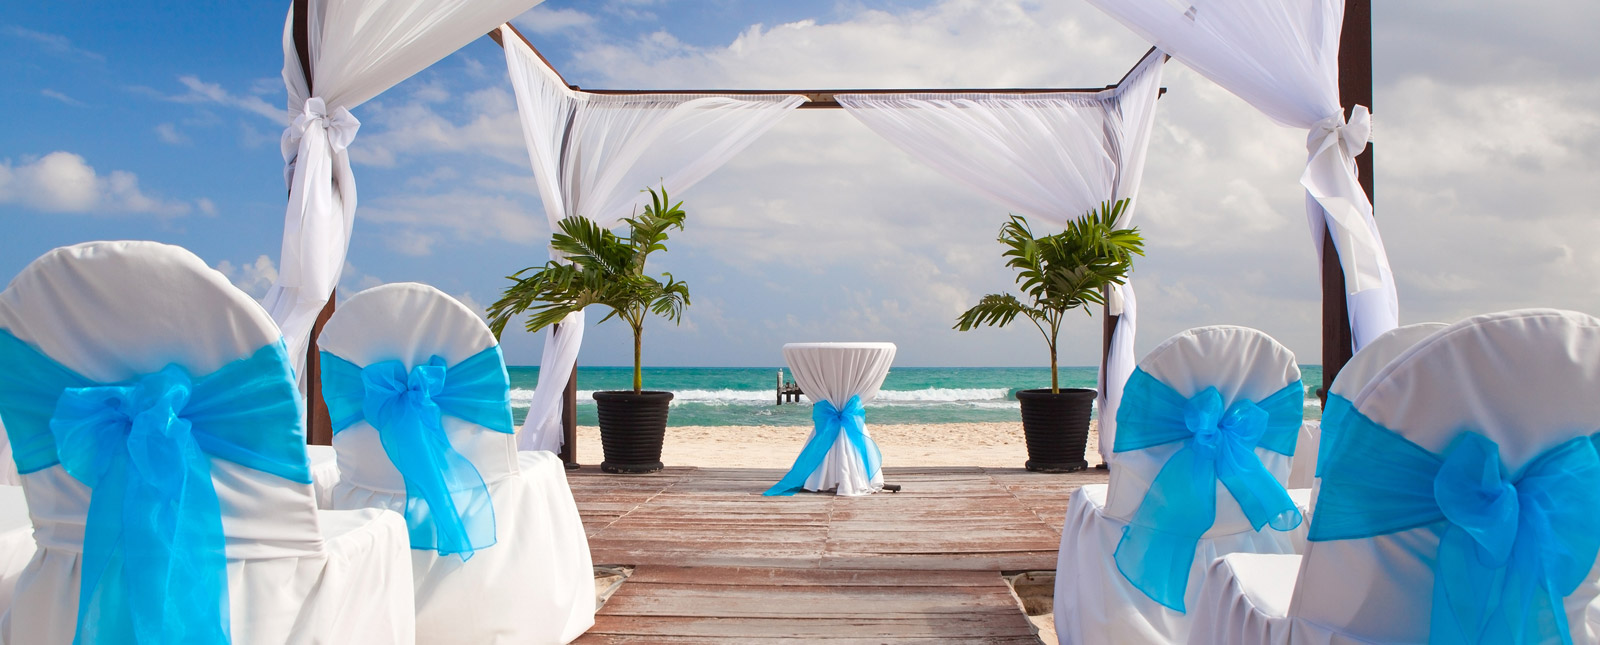 Heiraten Auf Mallorca Strand Heiraten Auf Mallorca